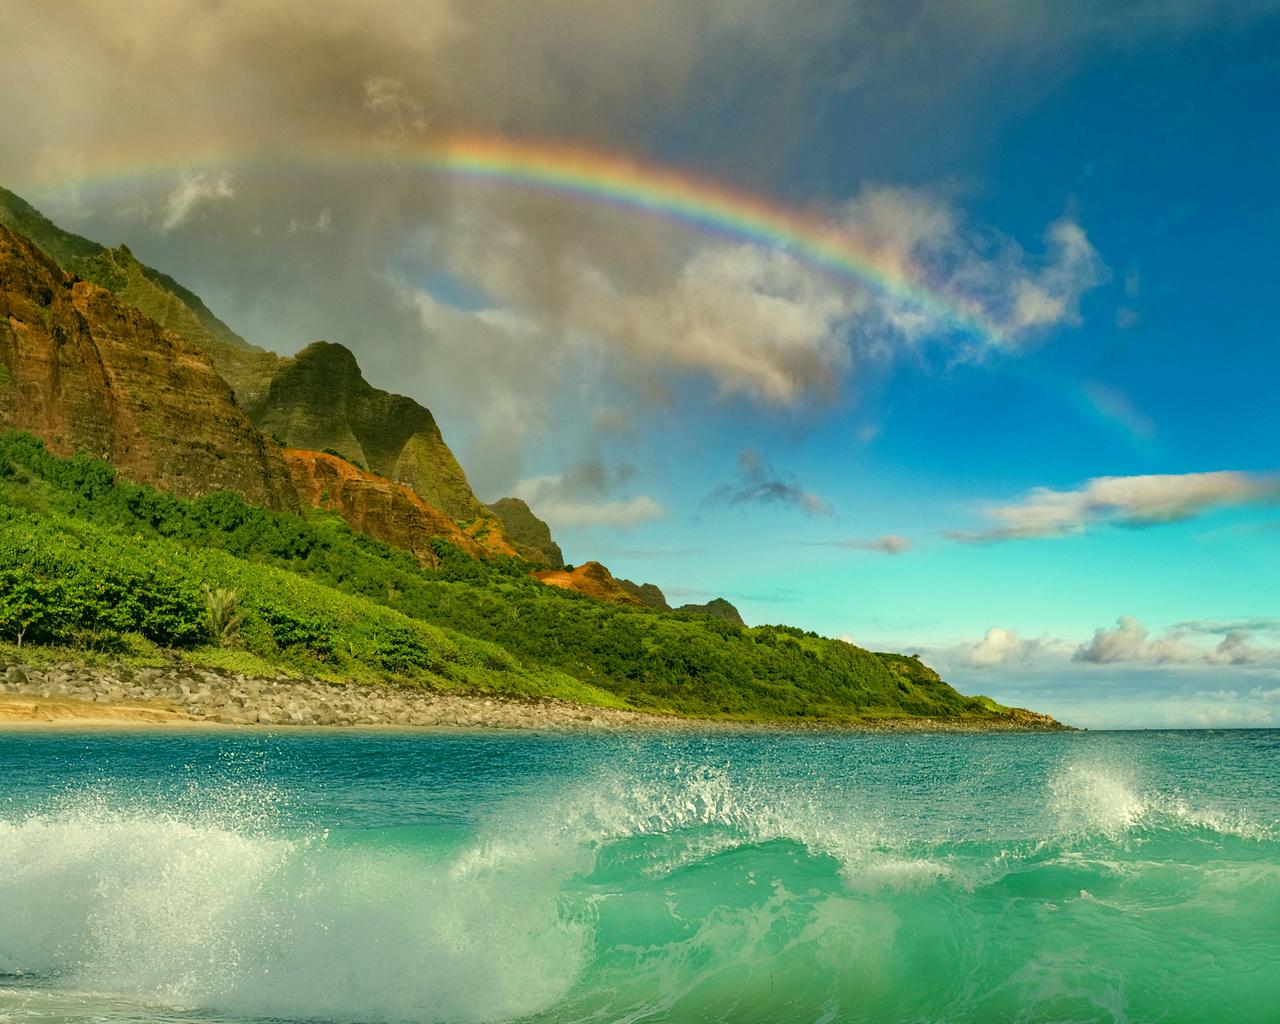 океан, прибой, радуга